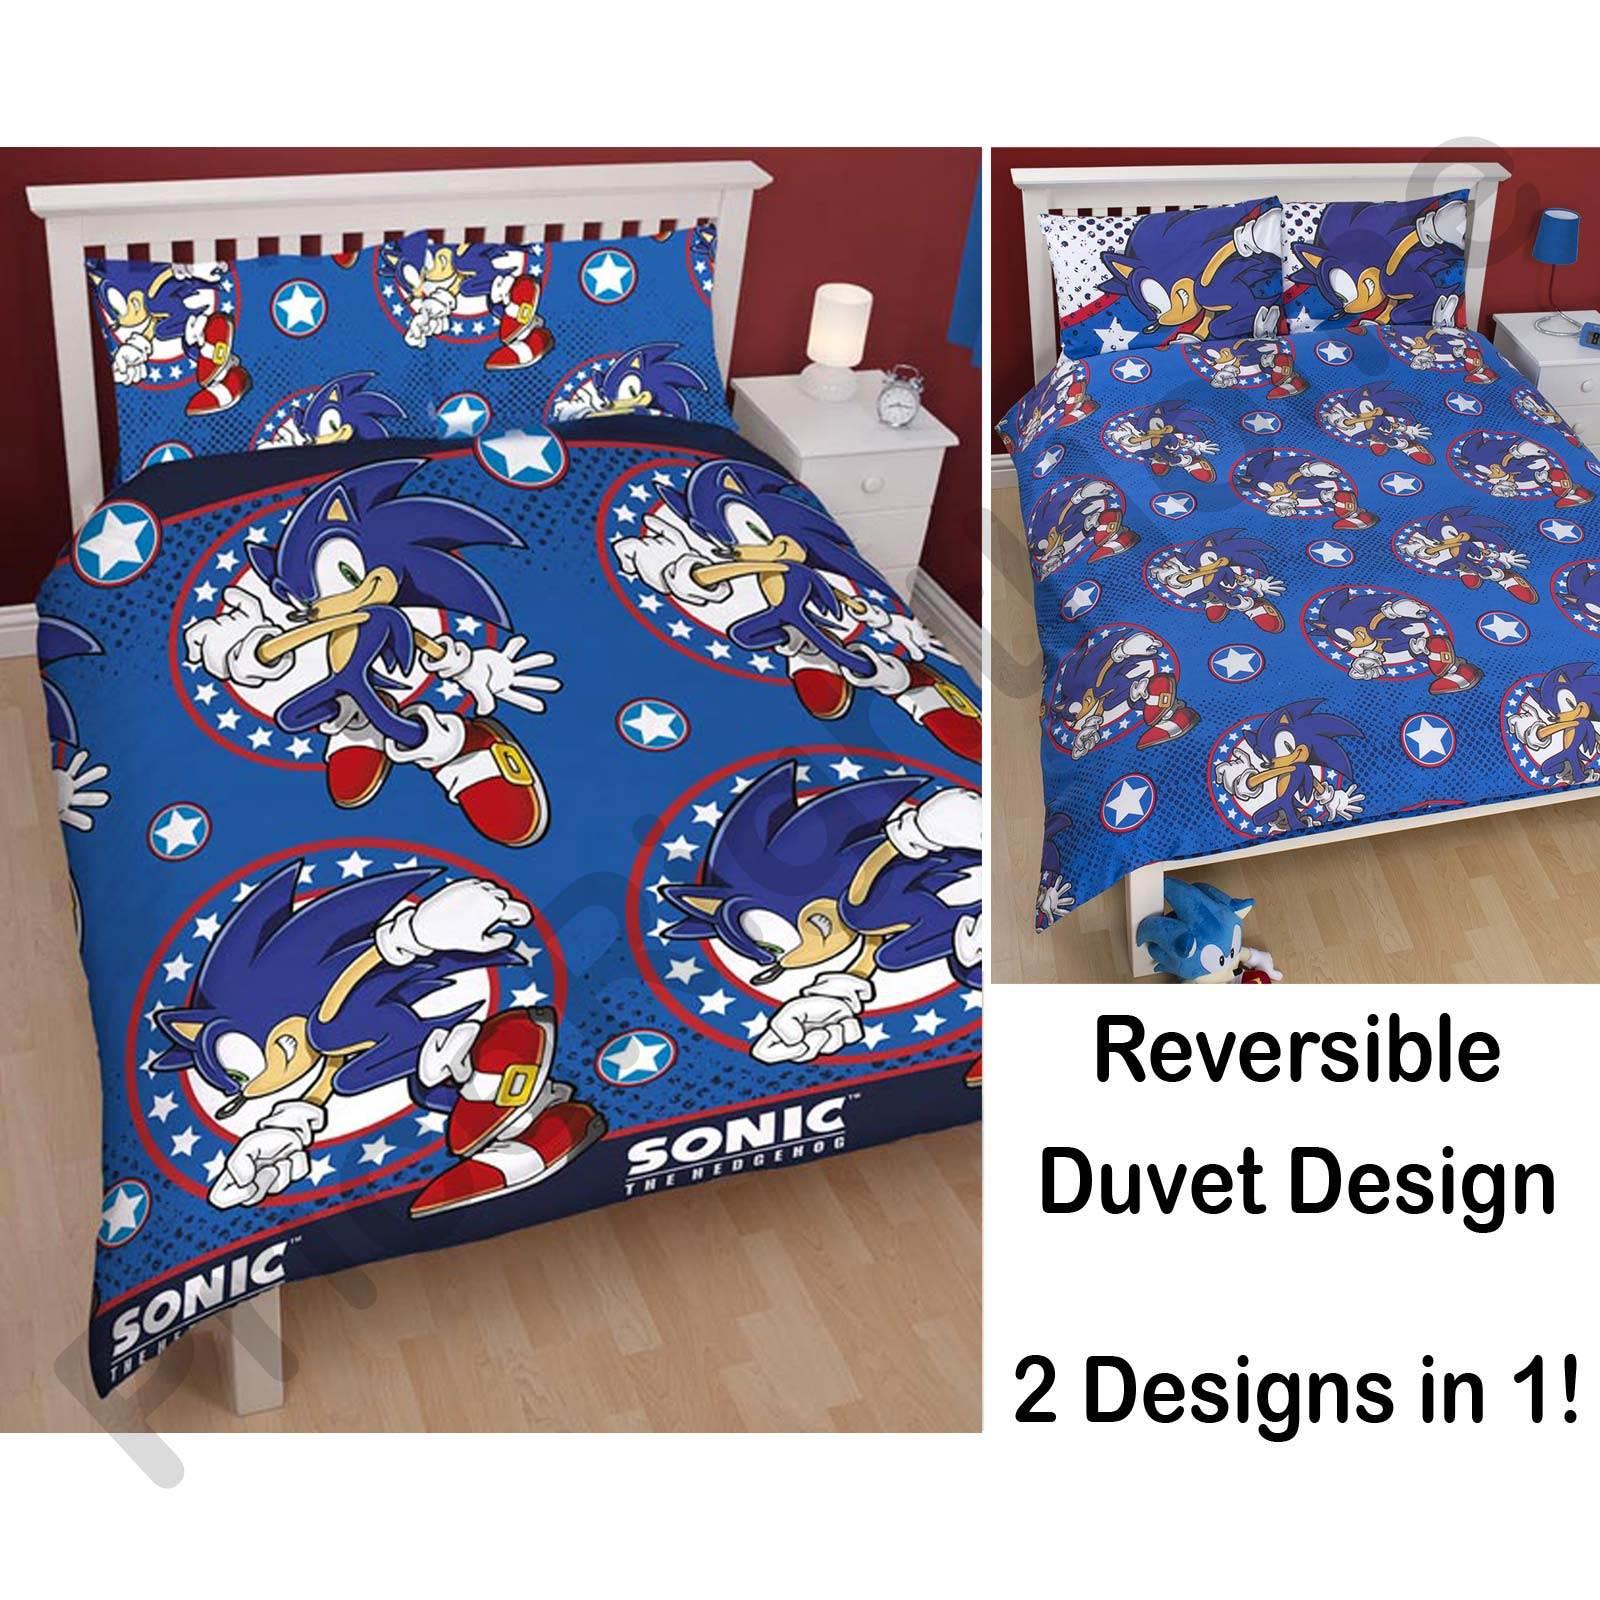 SONIC THE HEDGEHOG BEDROOM U2013 SINGLE + DOUBLE DUVET COVERS ... Item Specifics